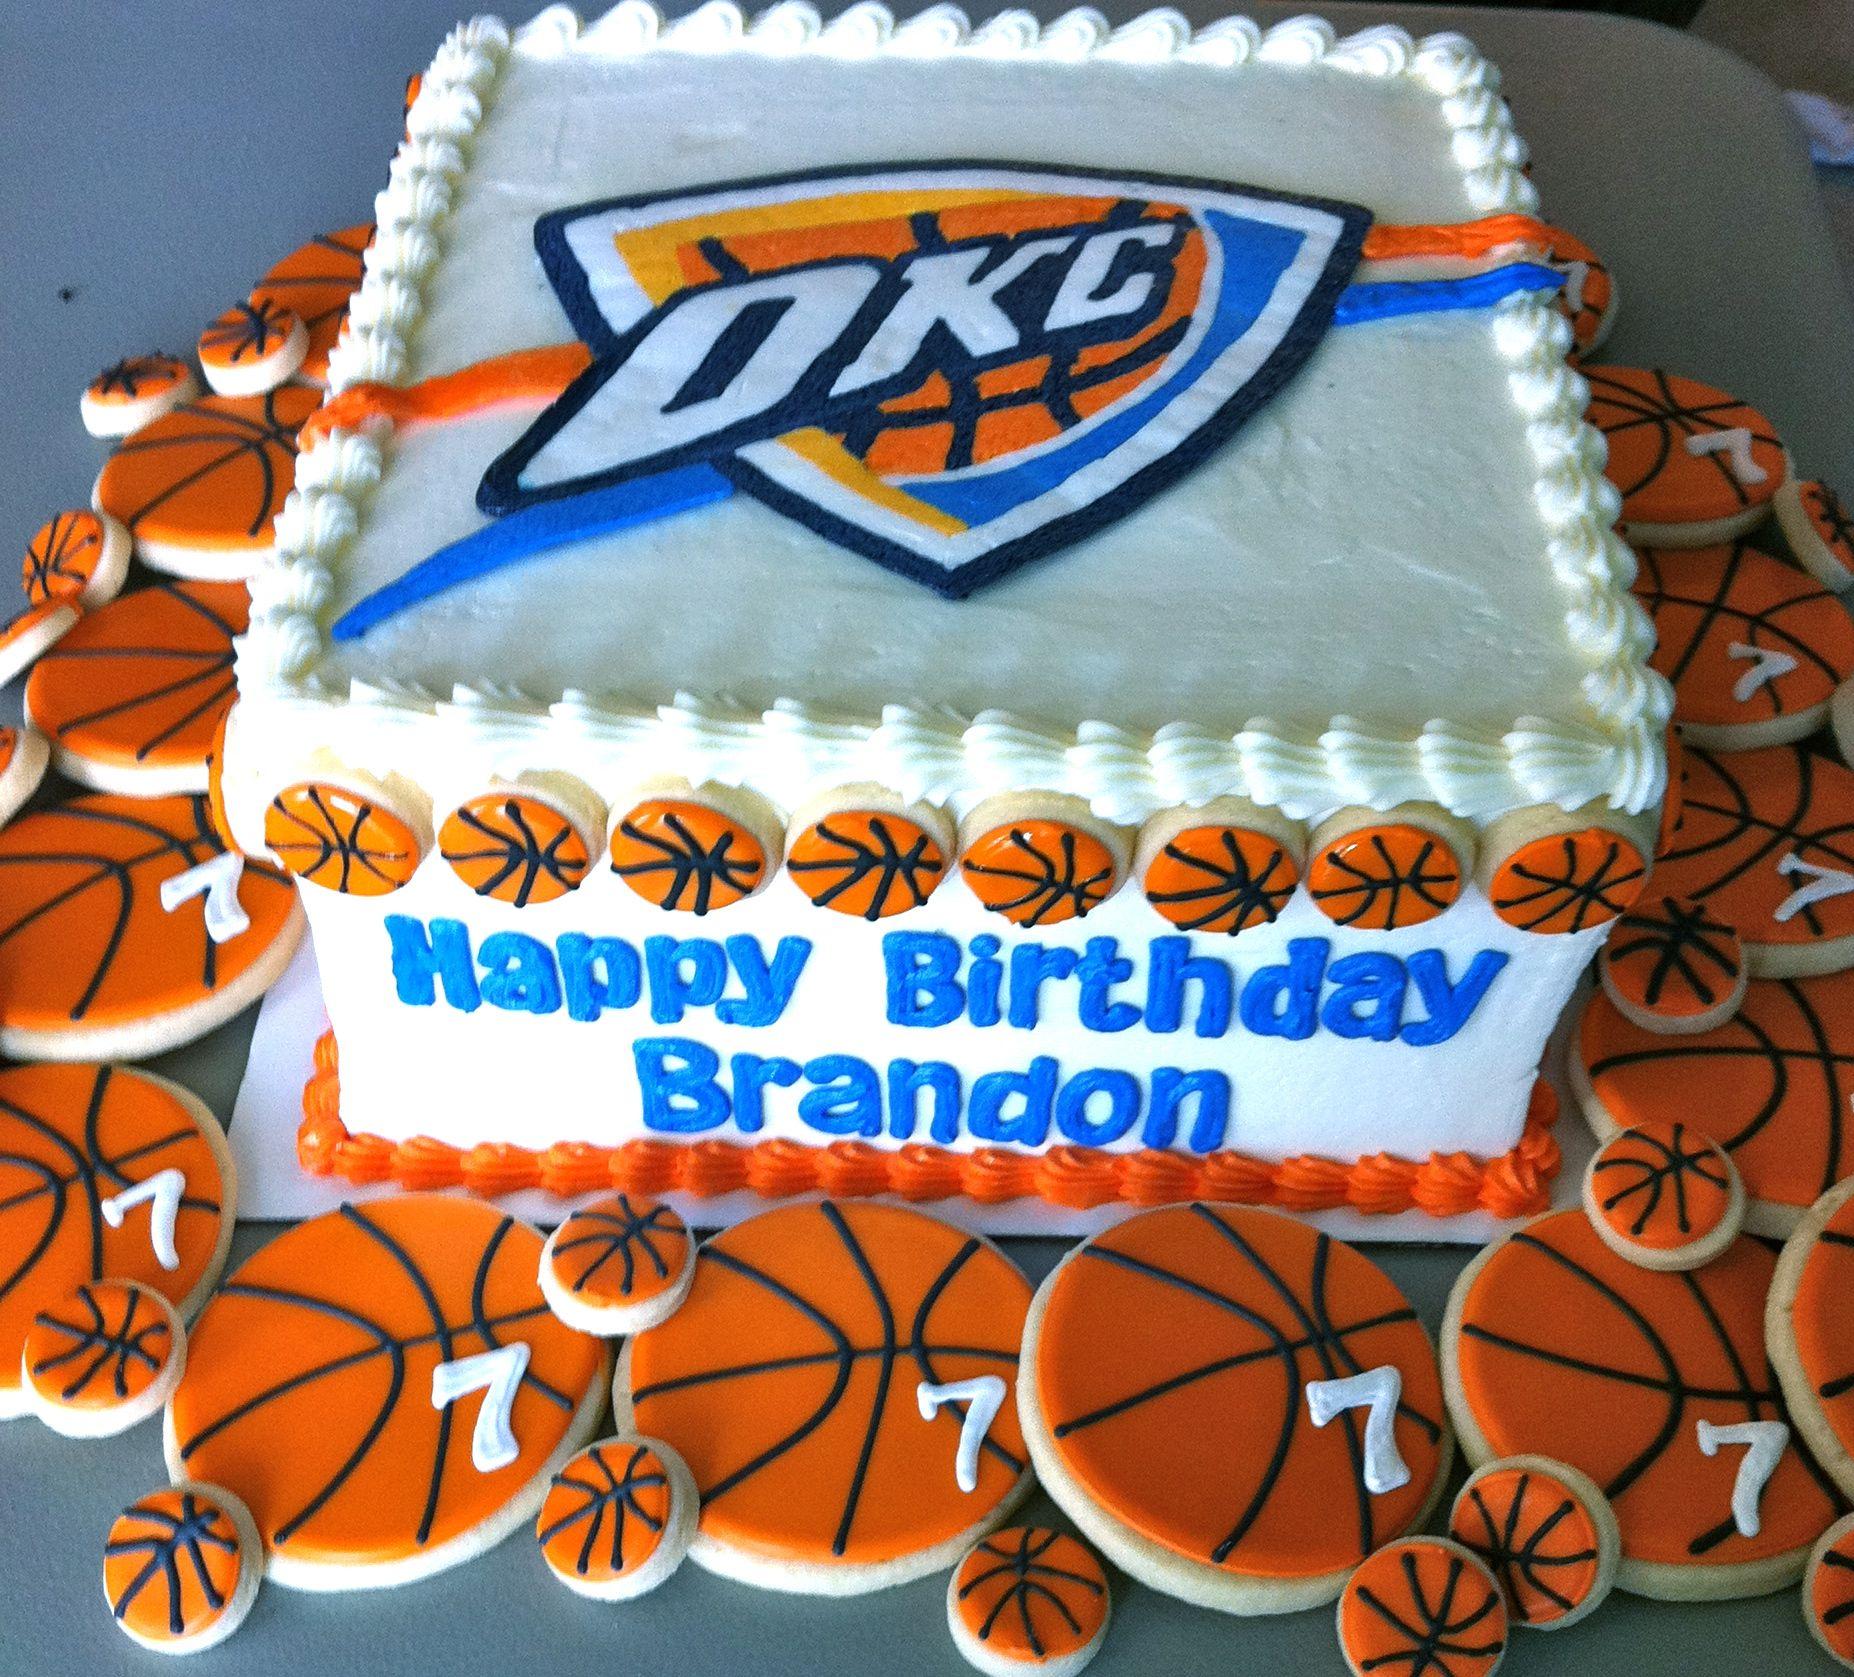 Superb Cakes With Images Thunder Cake Basketball Birthday 13 Funny Birthday Cards Online Inifofree Goldxyz